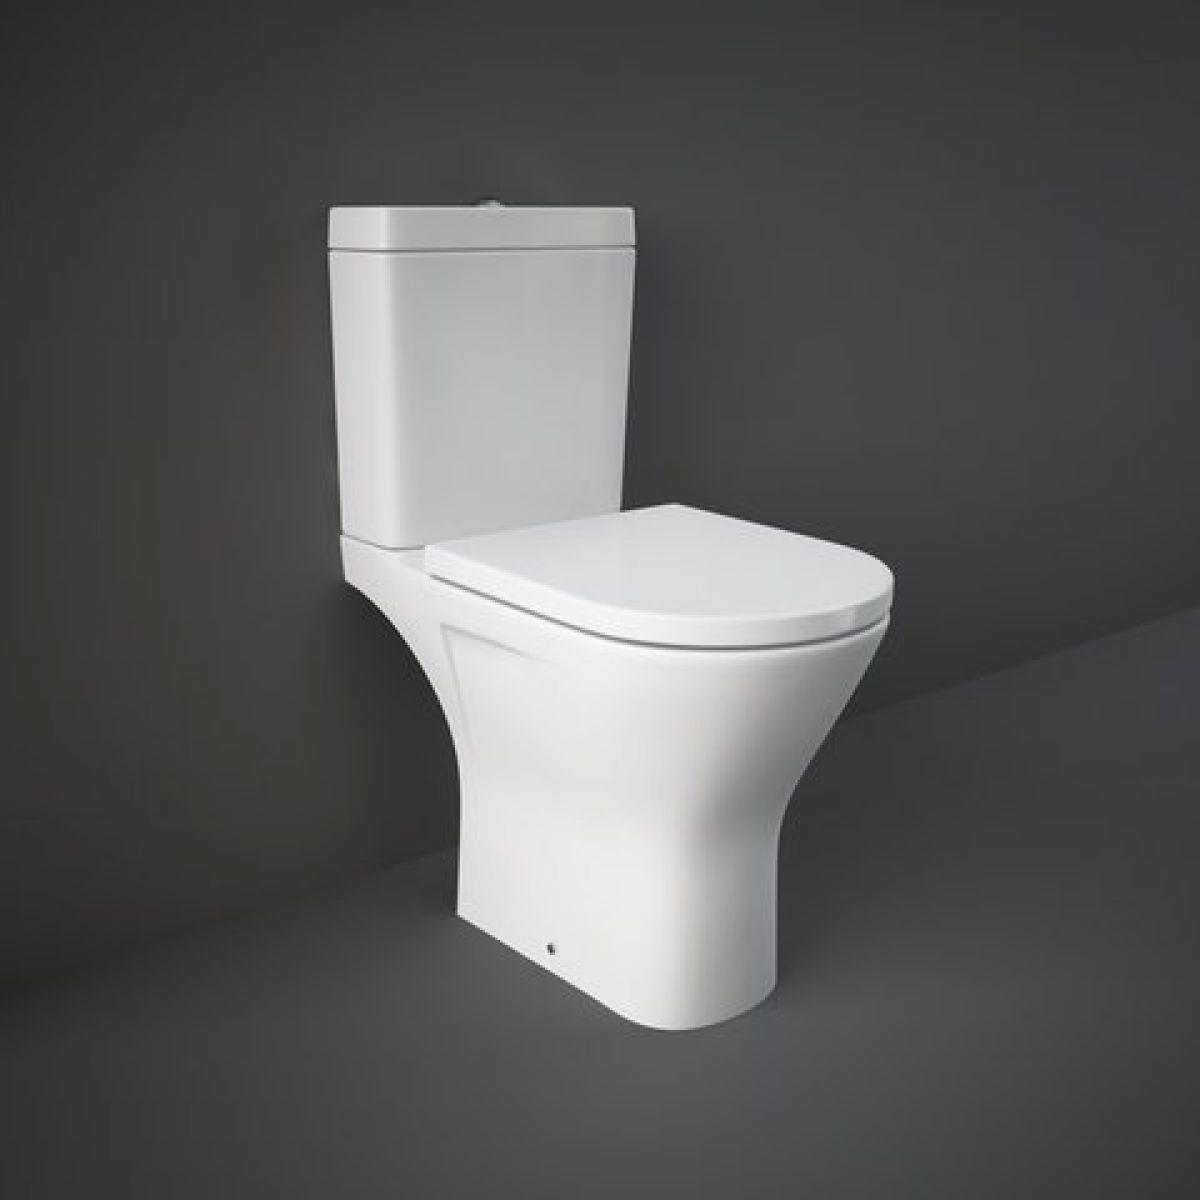 RAK Resort Comfort Height Maxi Close Coupled Open Back Rimless Toilet Suite